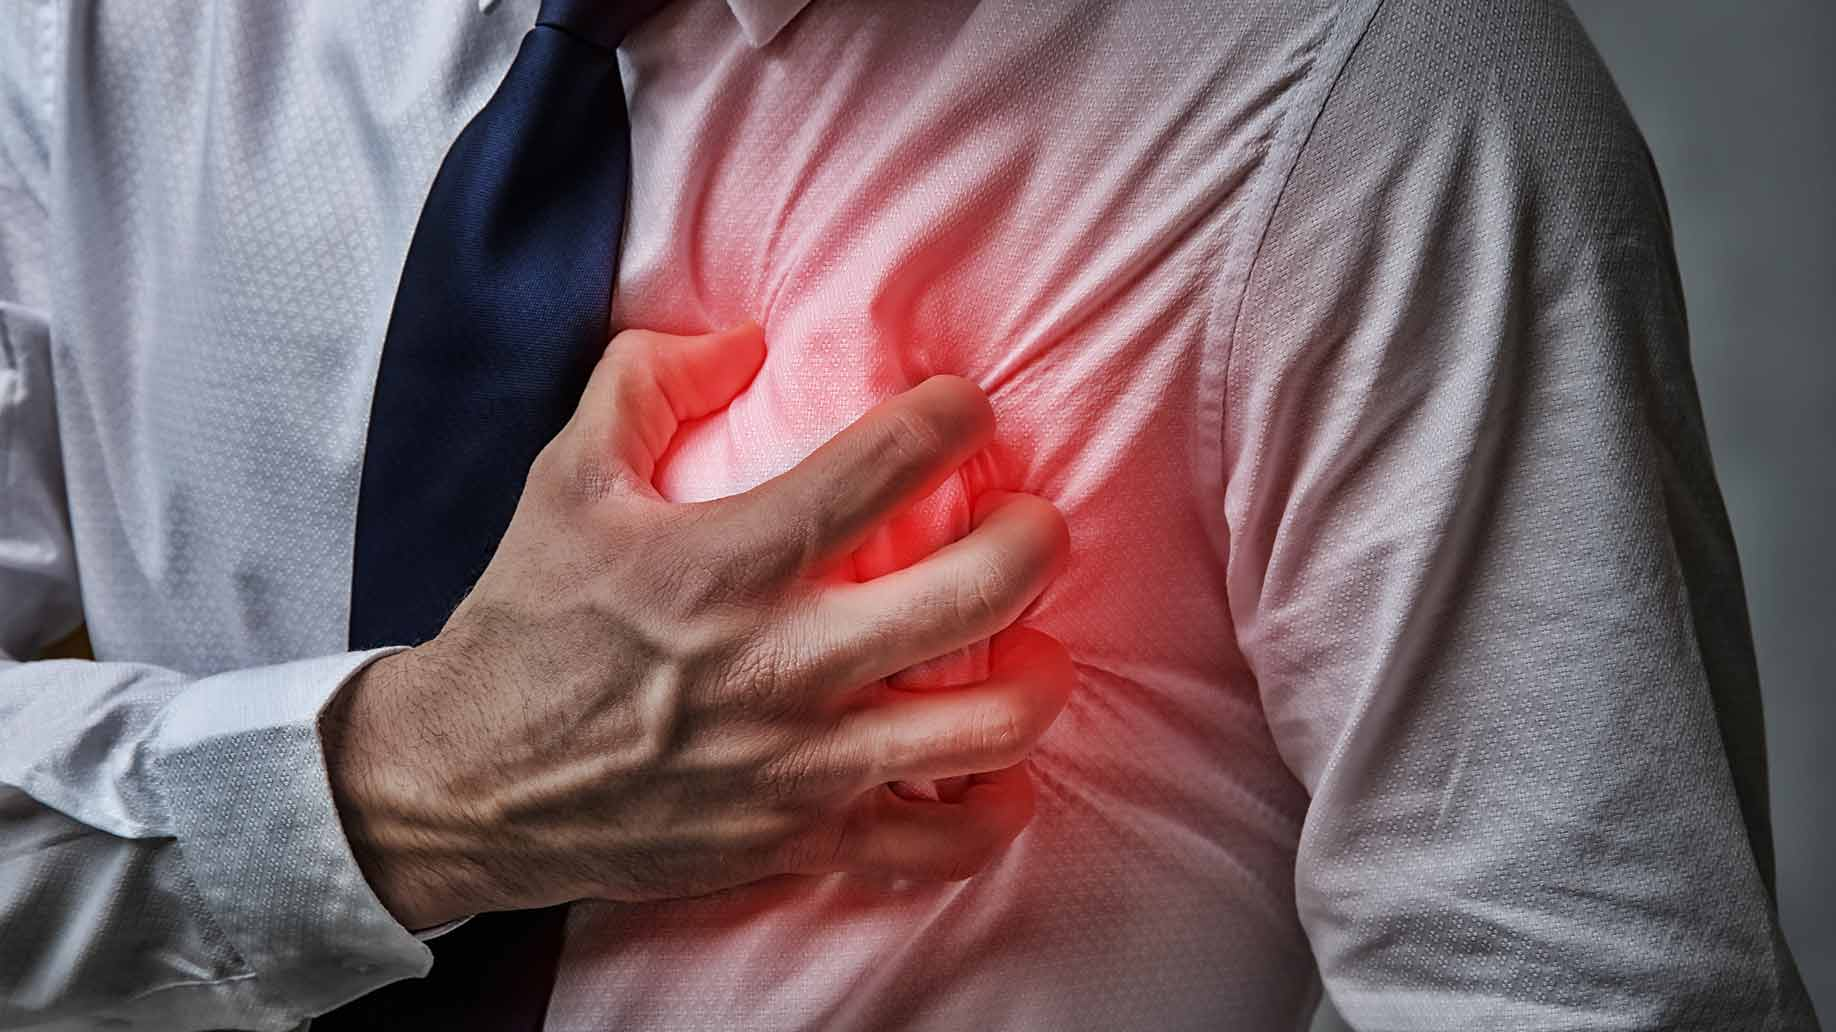 heart cardiovascular disease inflammation pain attack stroke turmeric curcumin natural remedies health benefits